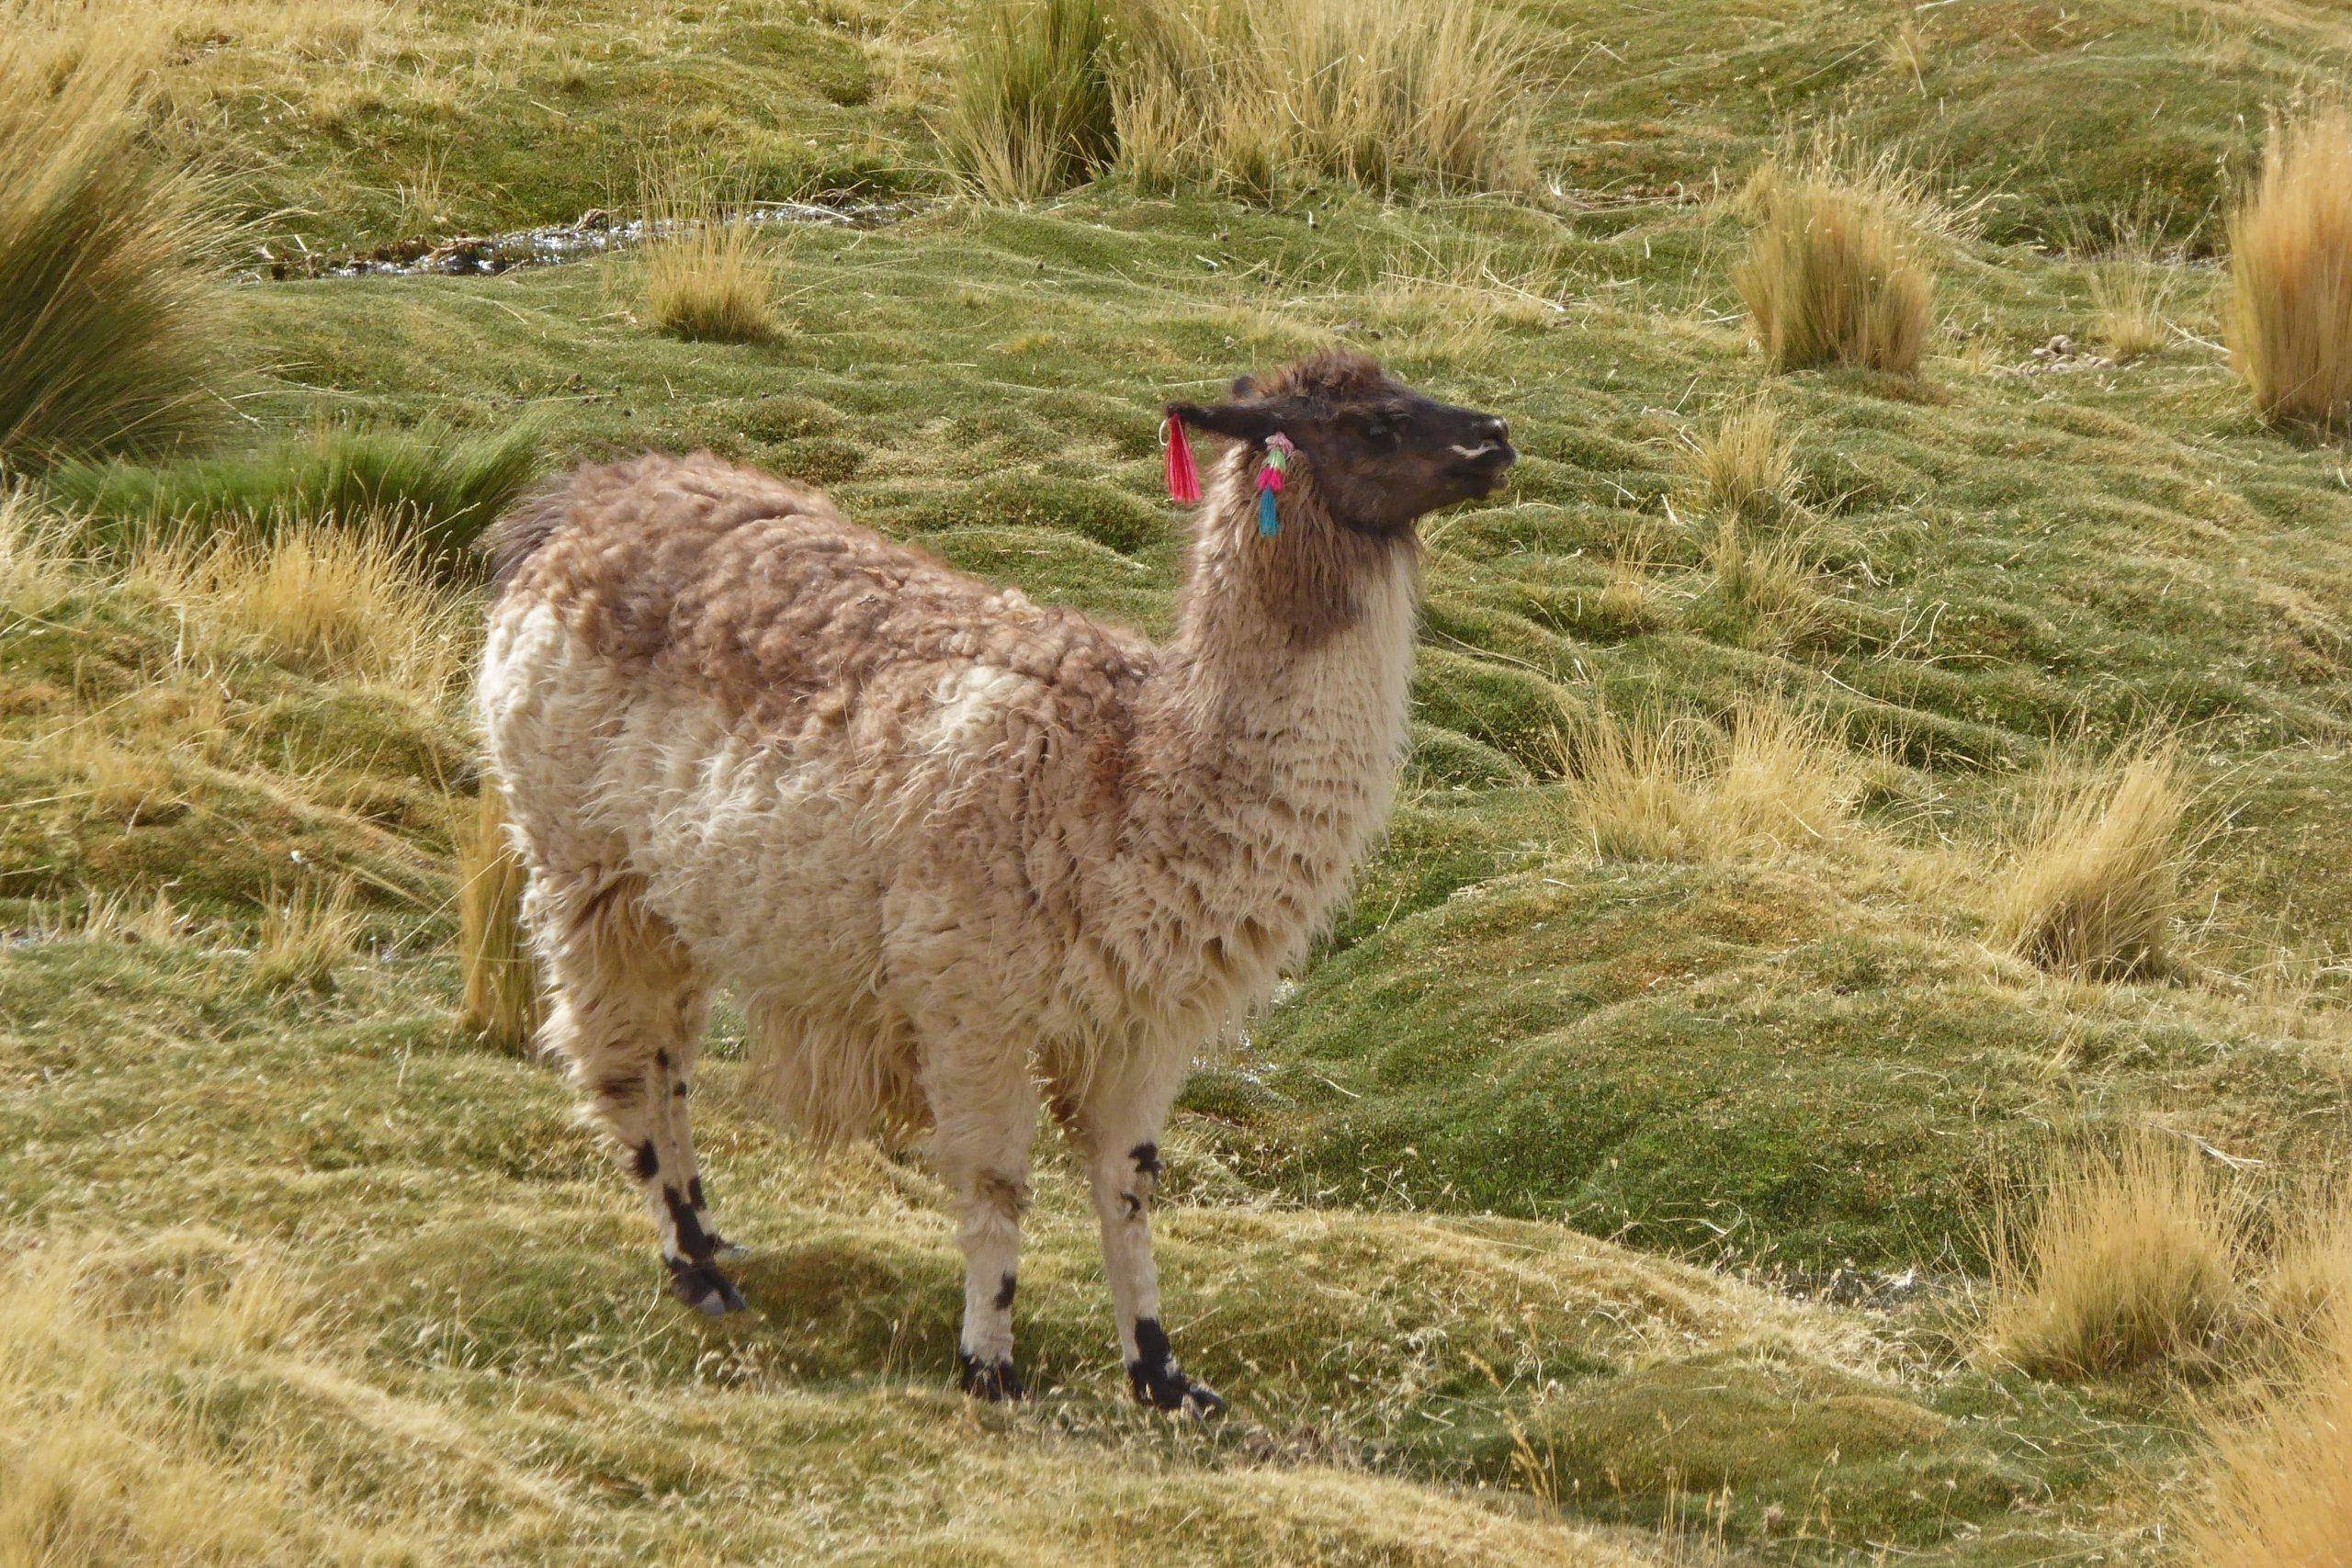 Radreise Südamerika 2019 - Alpaka